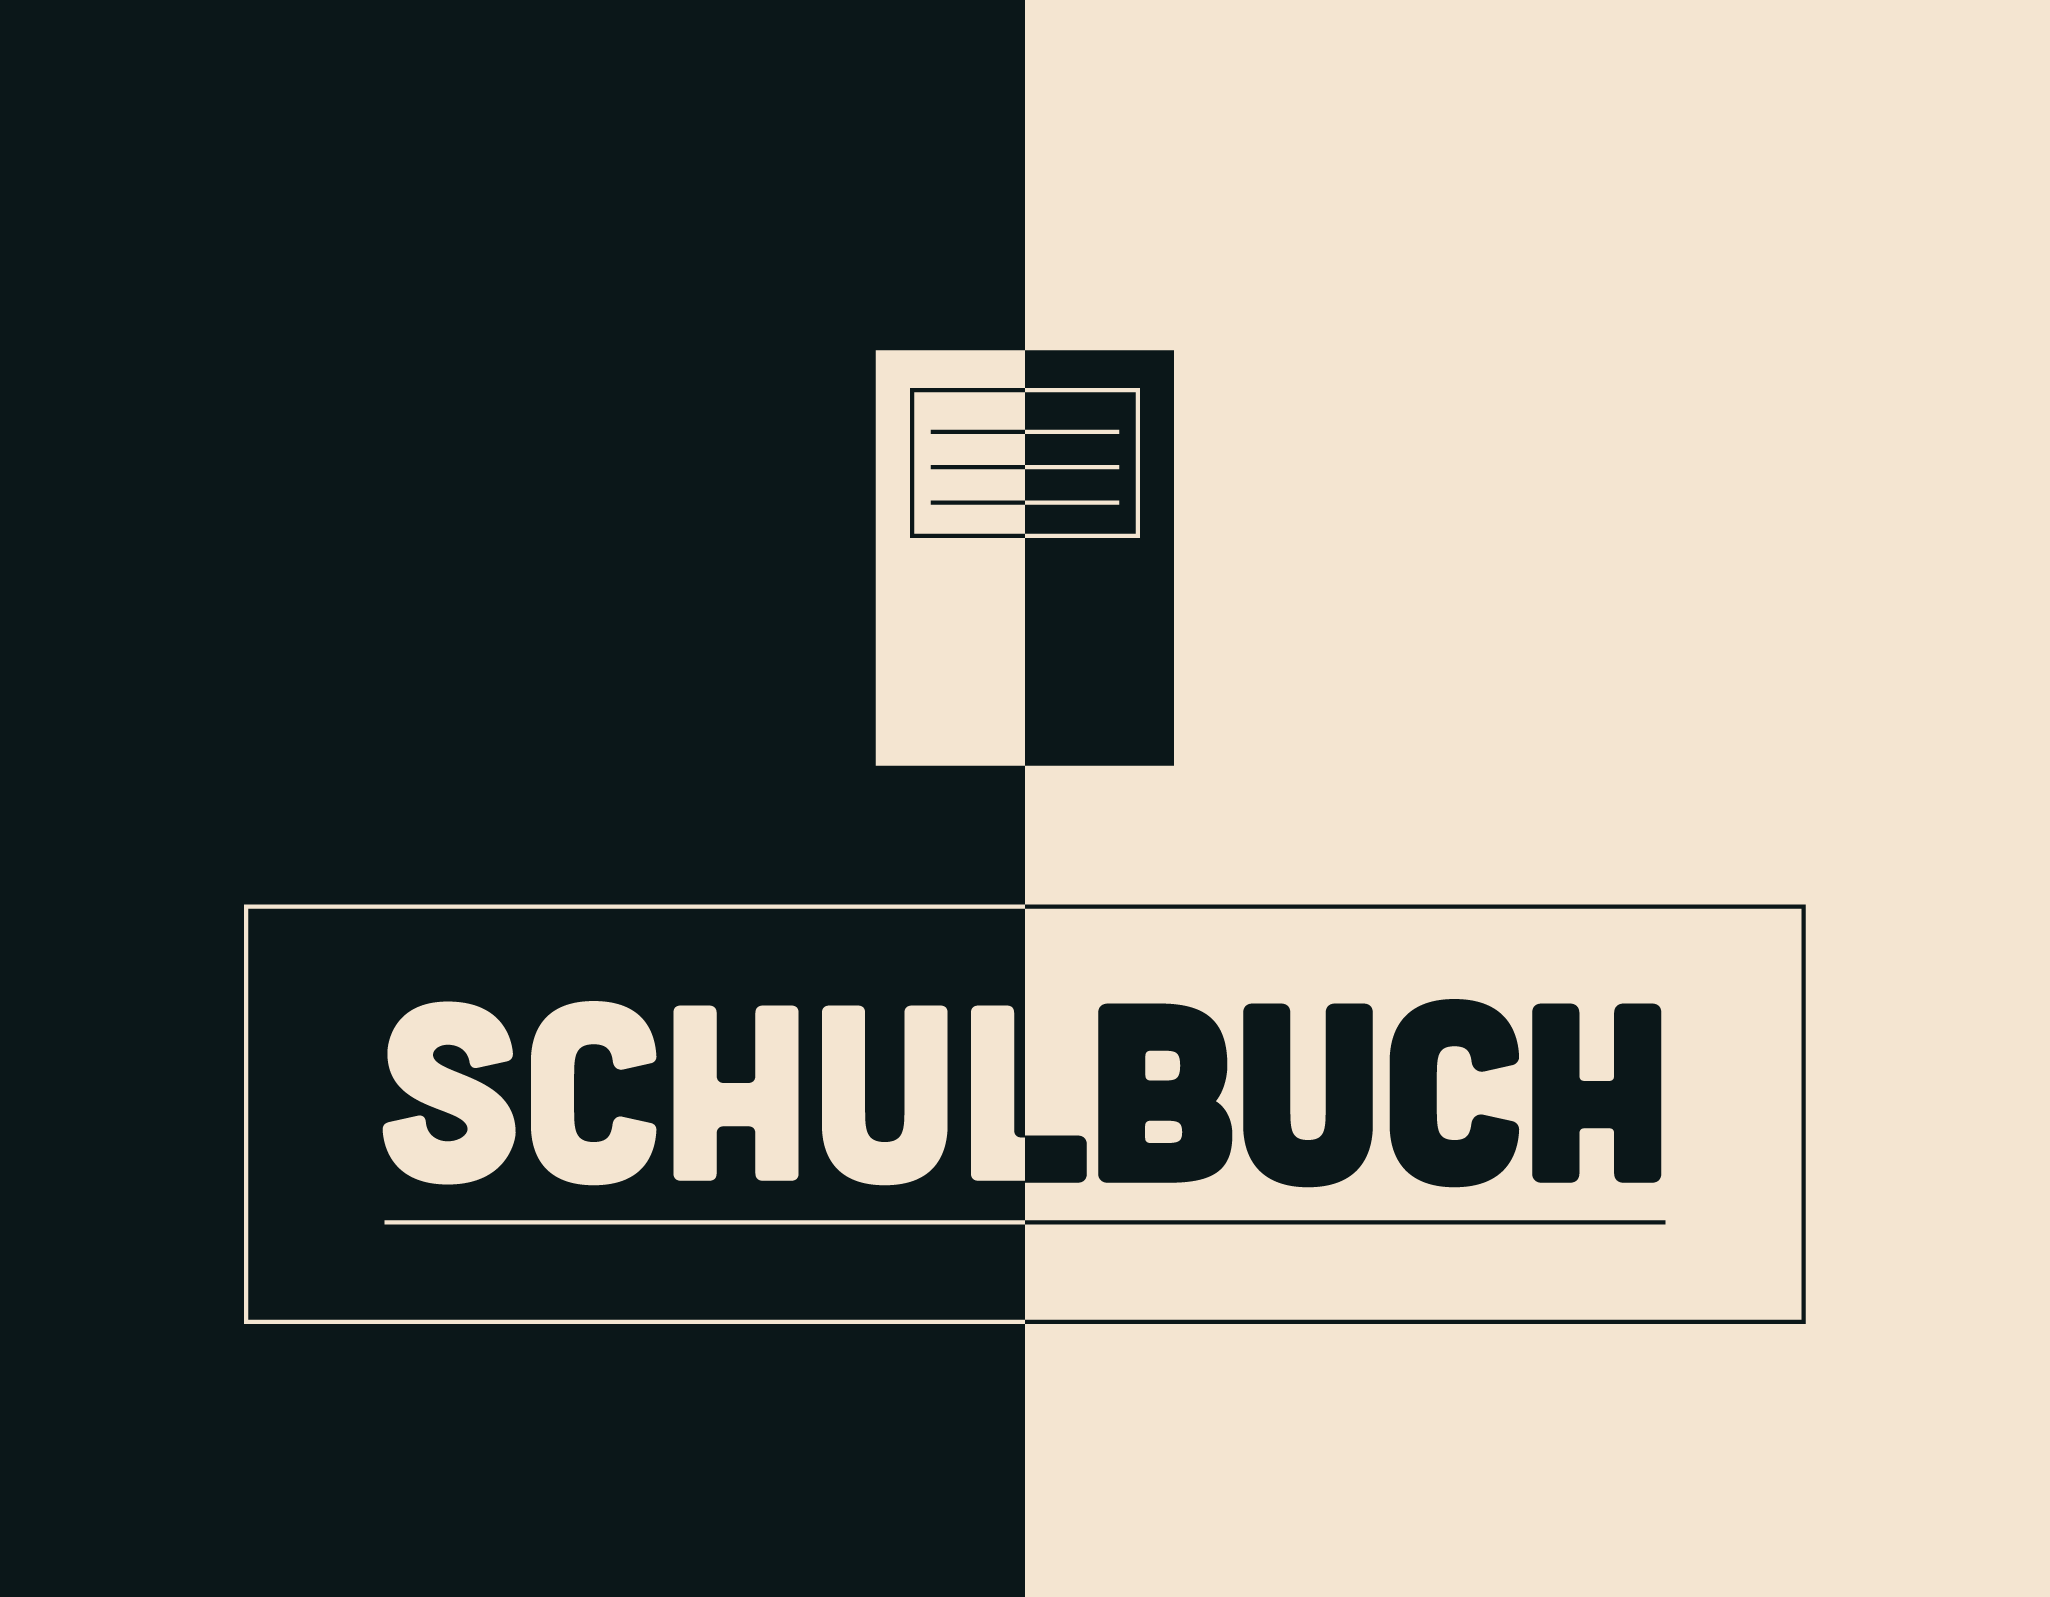 Schulbuch-06